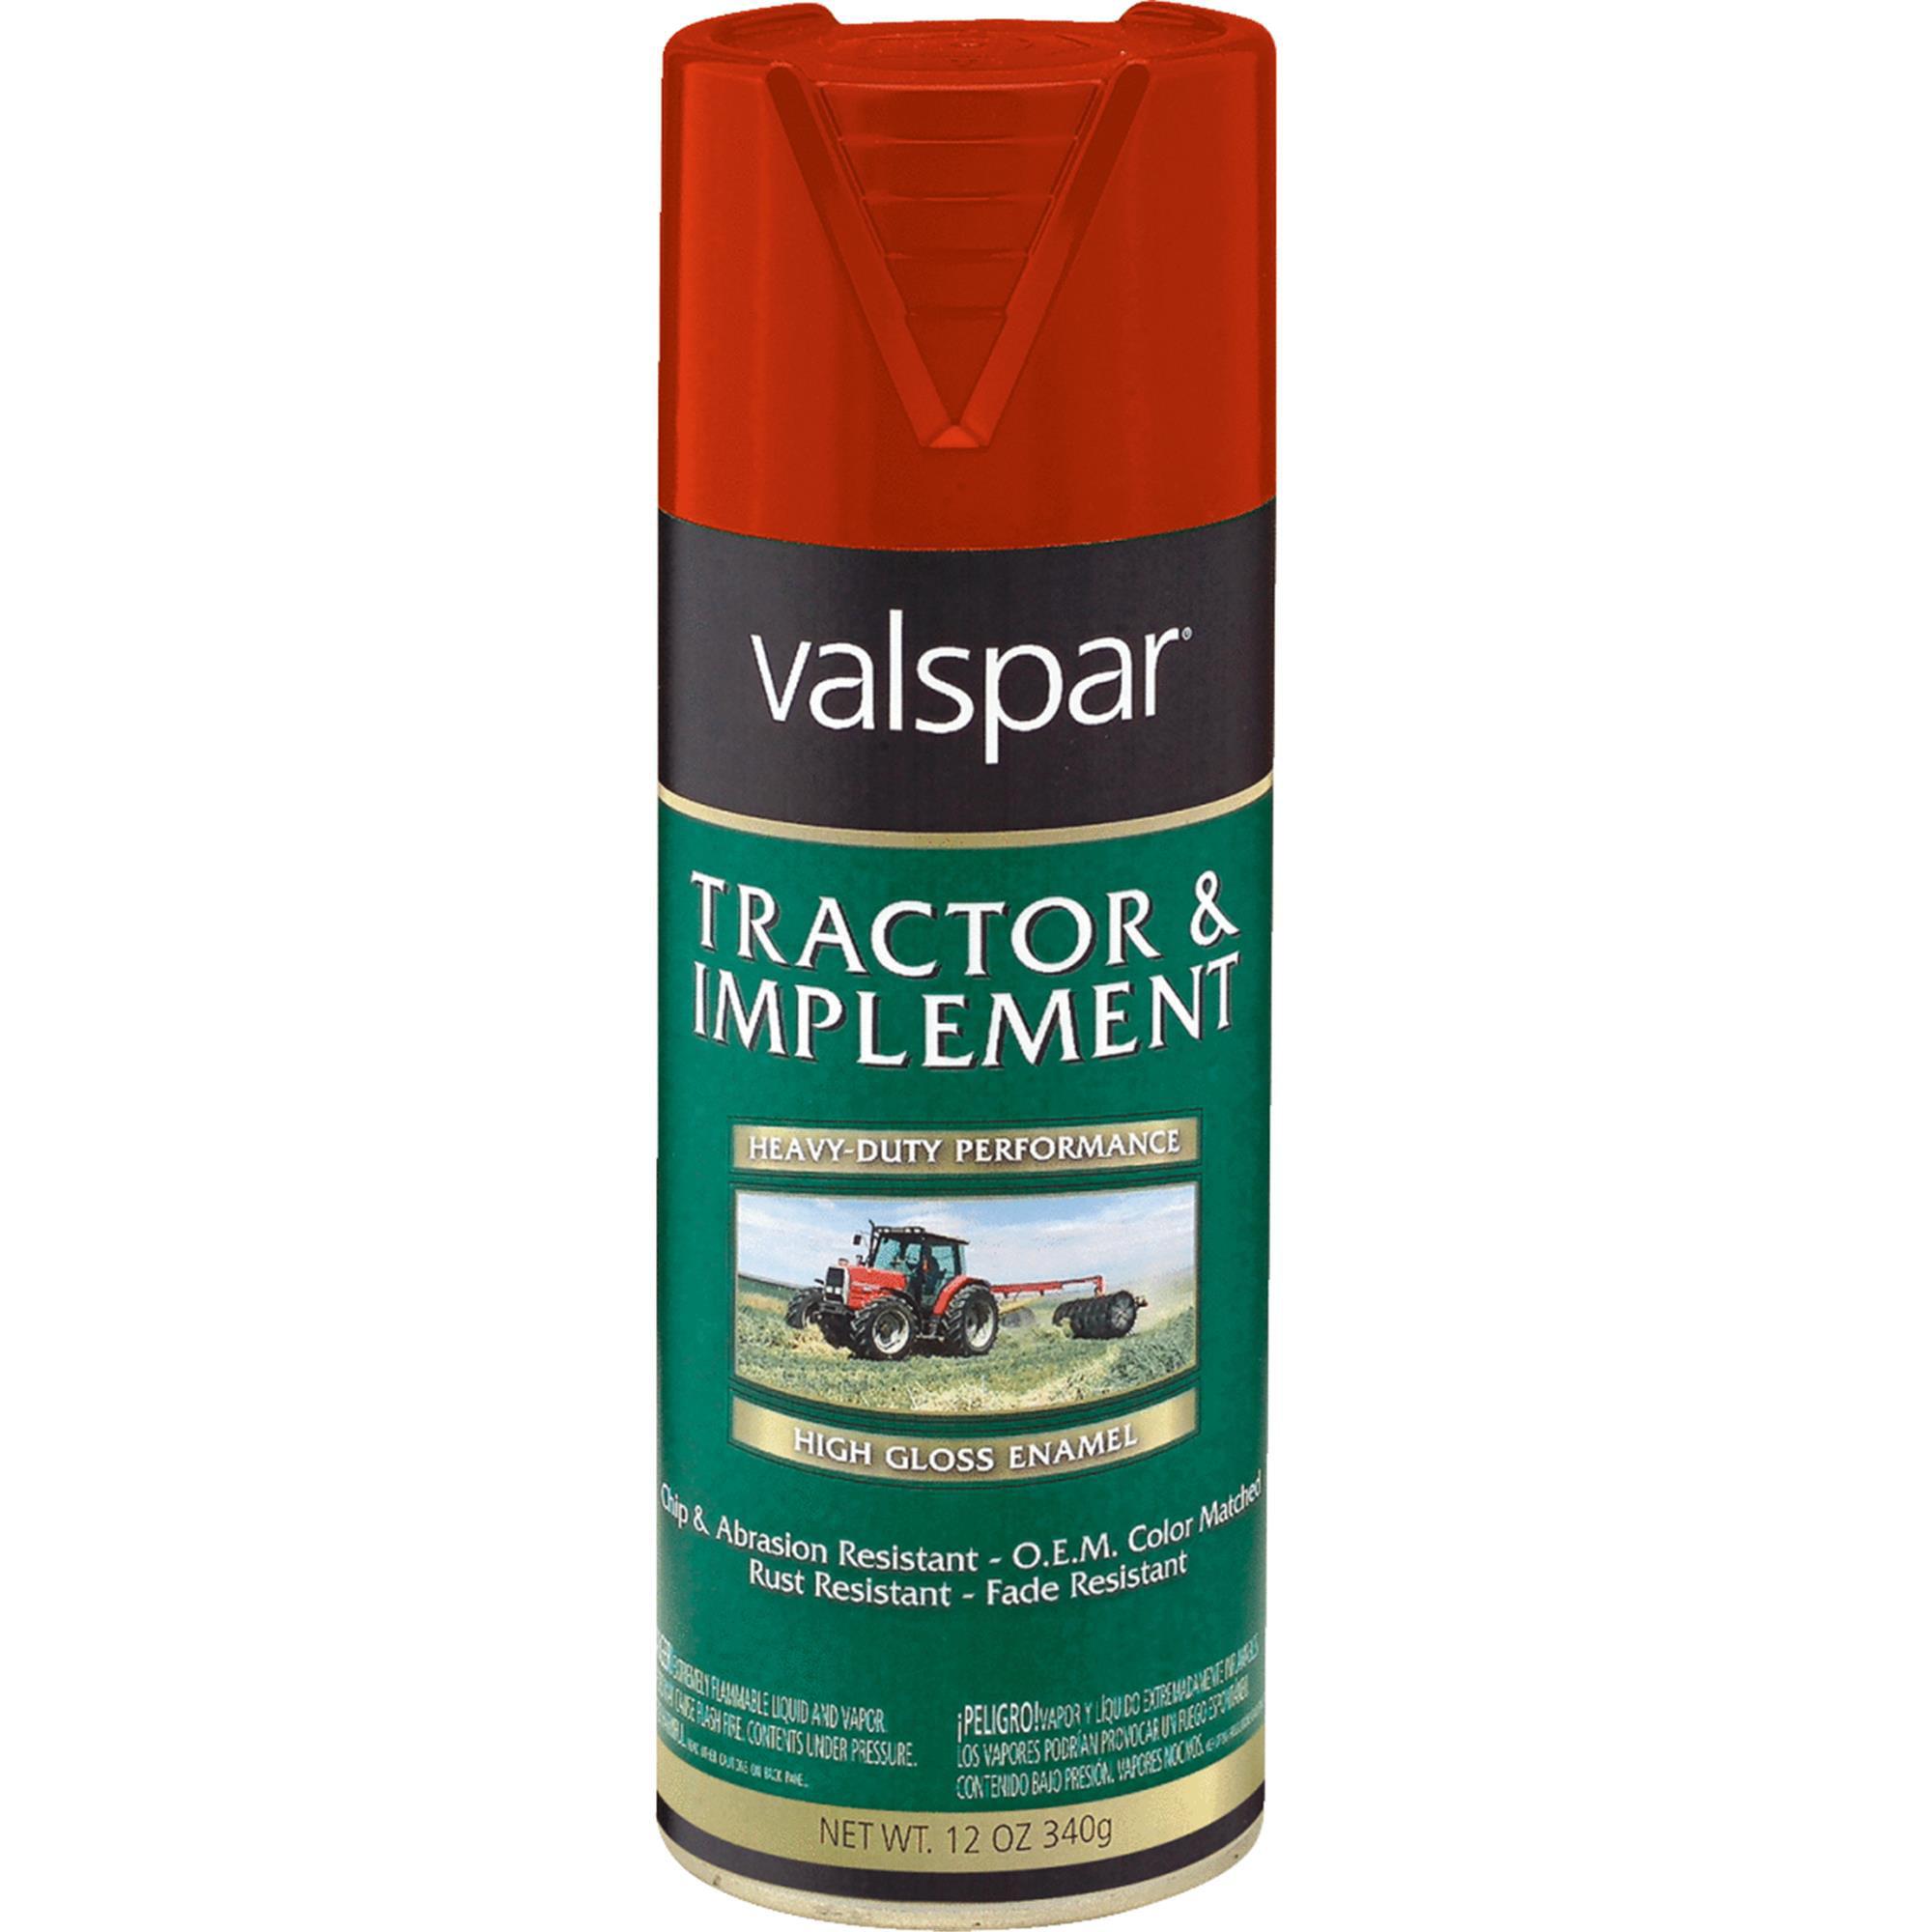 Valspar Tractor U0026 Implement Spray Paint Enamel   Walmart.com